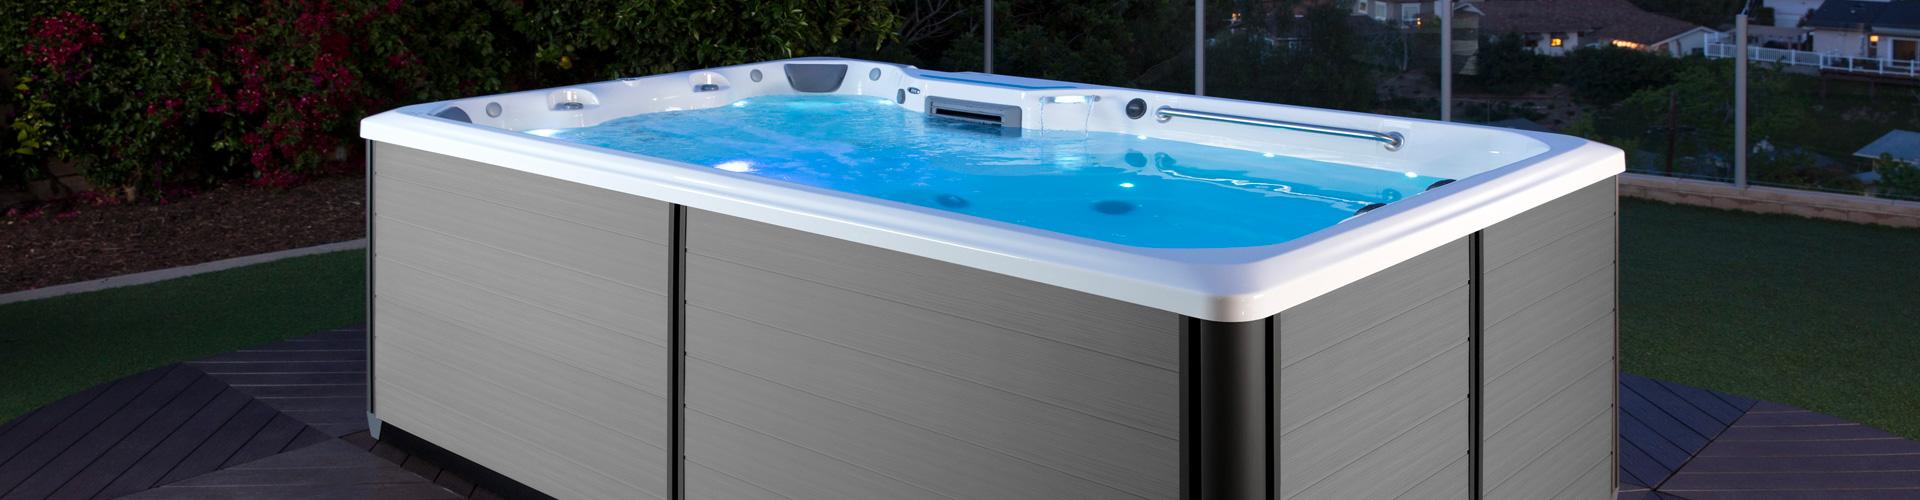 3 Reasons to Choose a Swim Spa, Lap Pools Clive